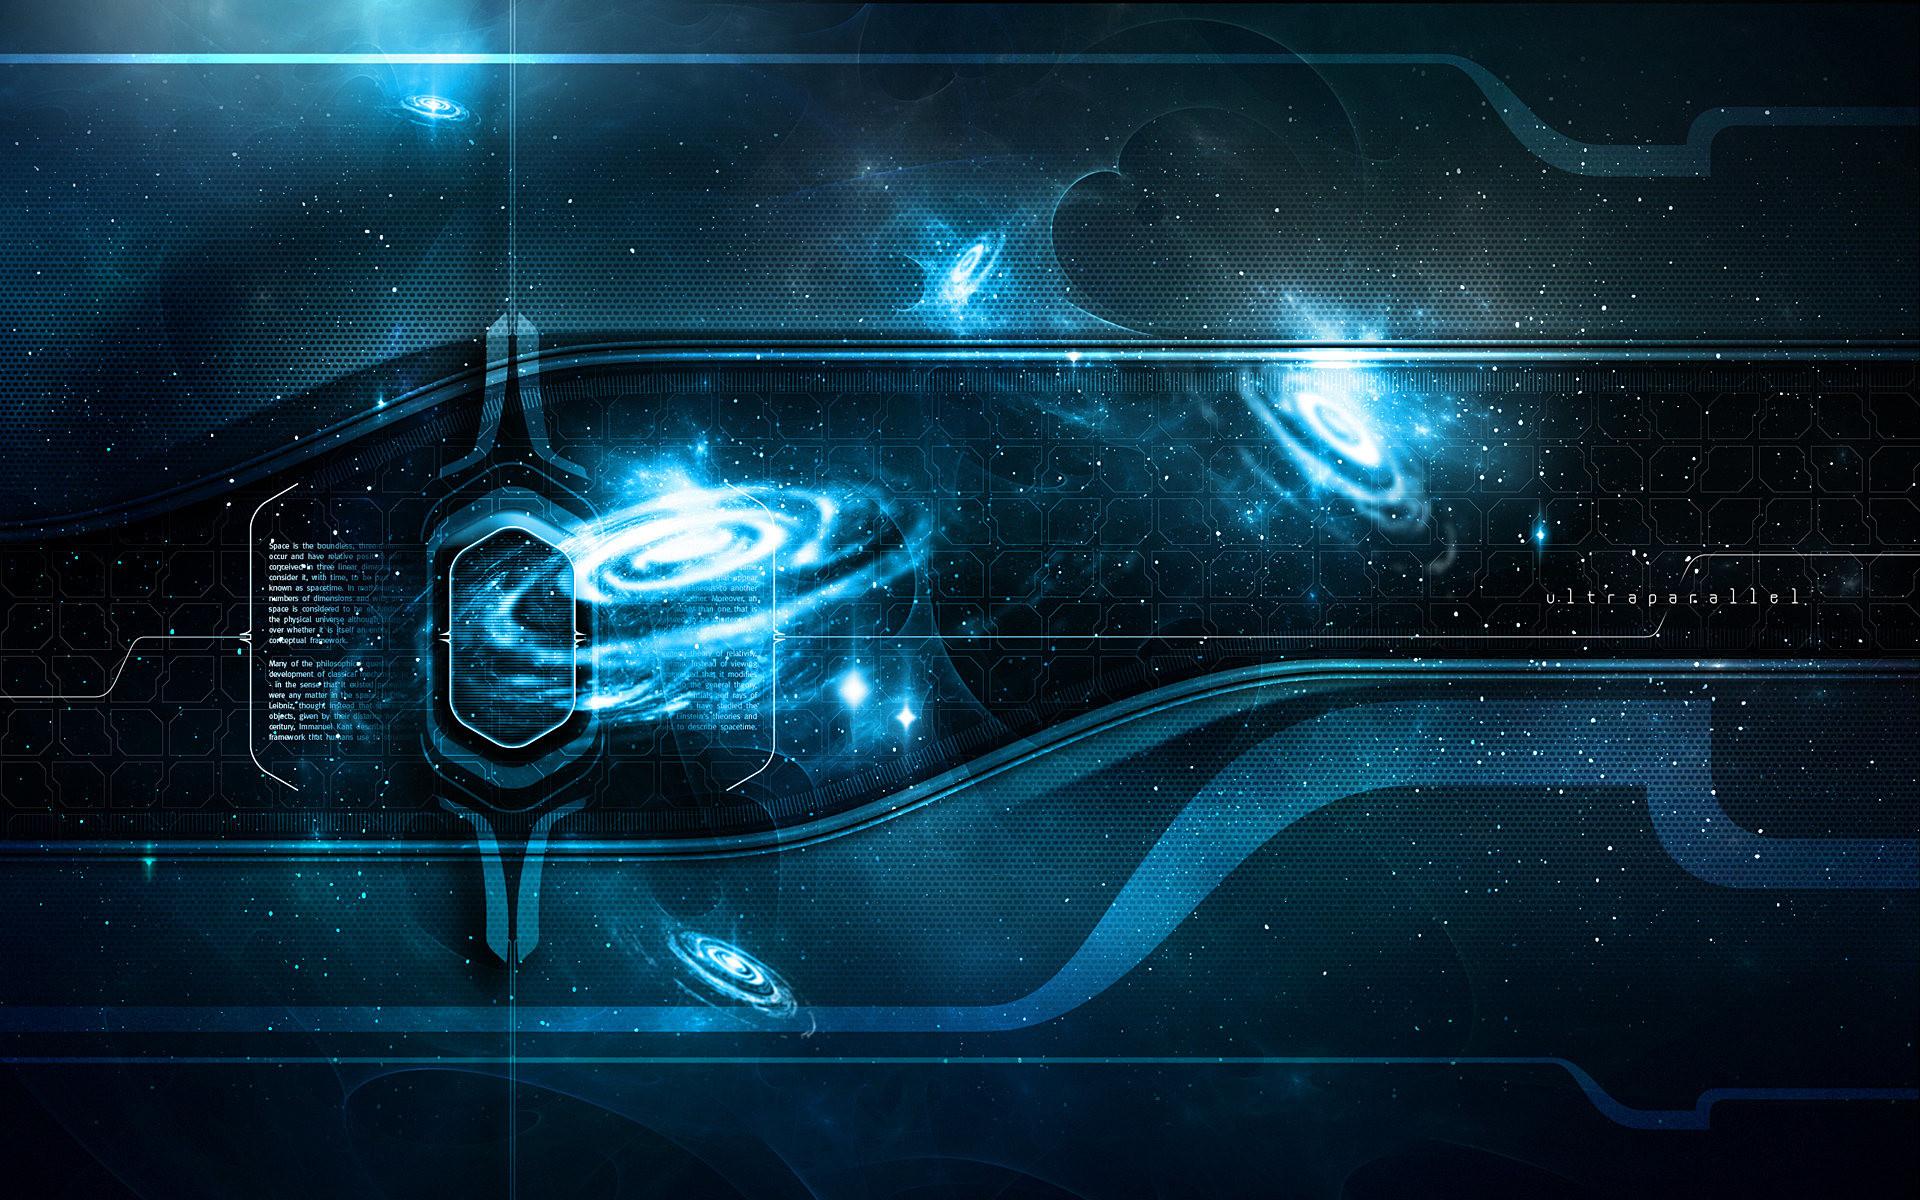 Future Background